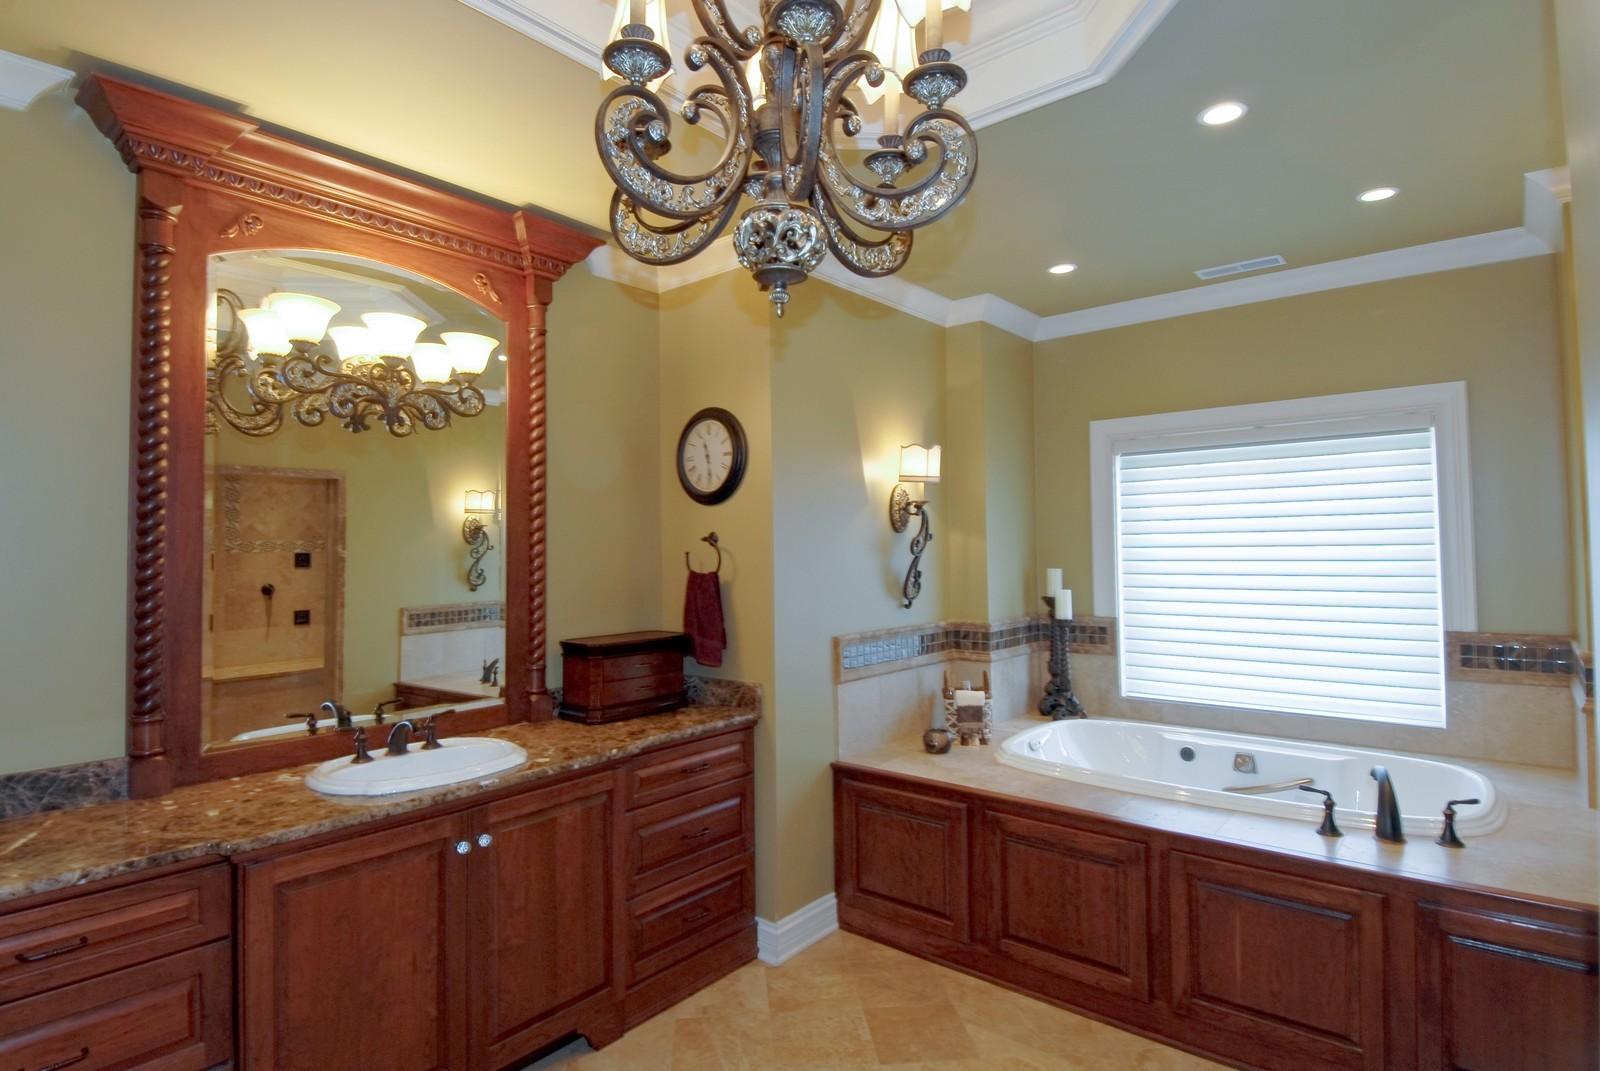 Real Estate Photography - 729 Wellner Dr, Naperville, IL, 60540 - Master Bathroom